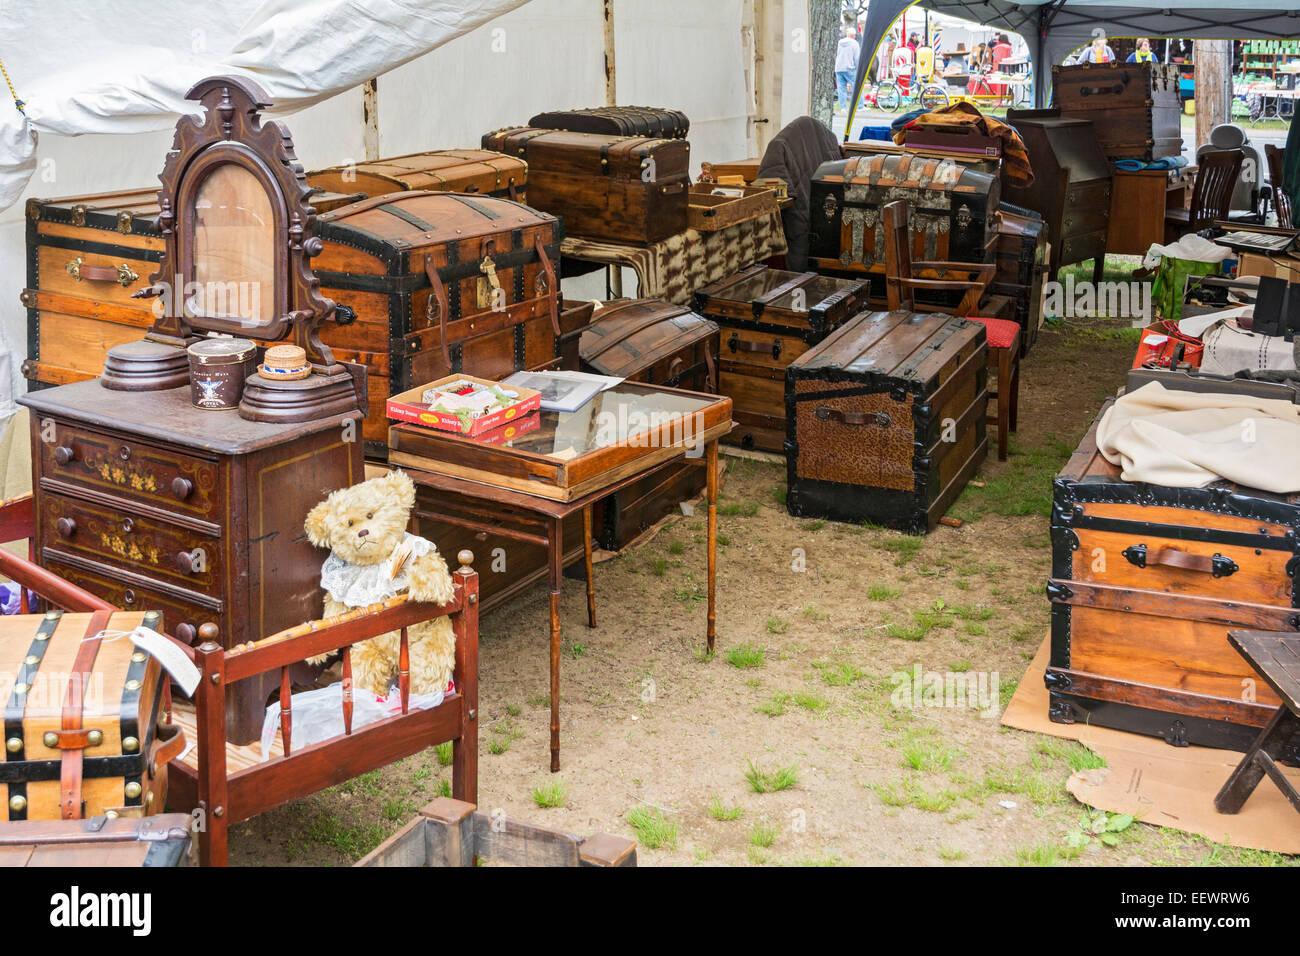 Massachusetts, Brimfield Antique Flea Market - Massachusetts, Brimfield Antique Flea Market Stock Photo: 78014194